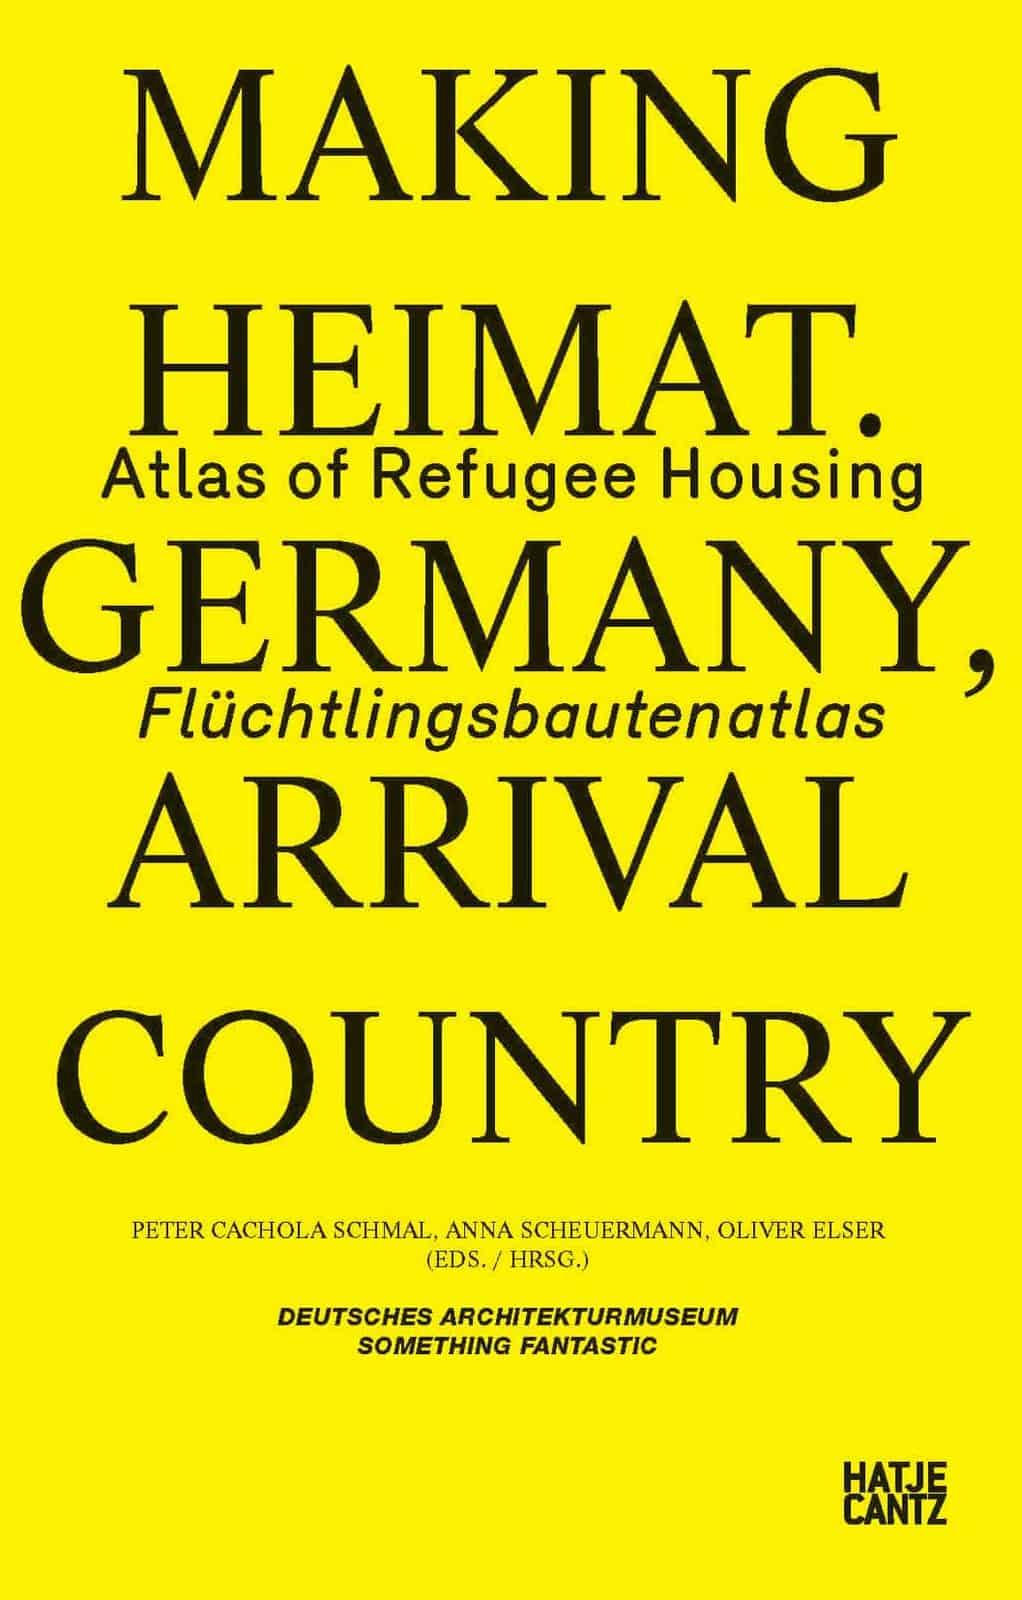 Making Heimat – Flüchtlingsbautenatlas \ © DAM